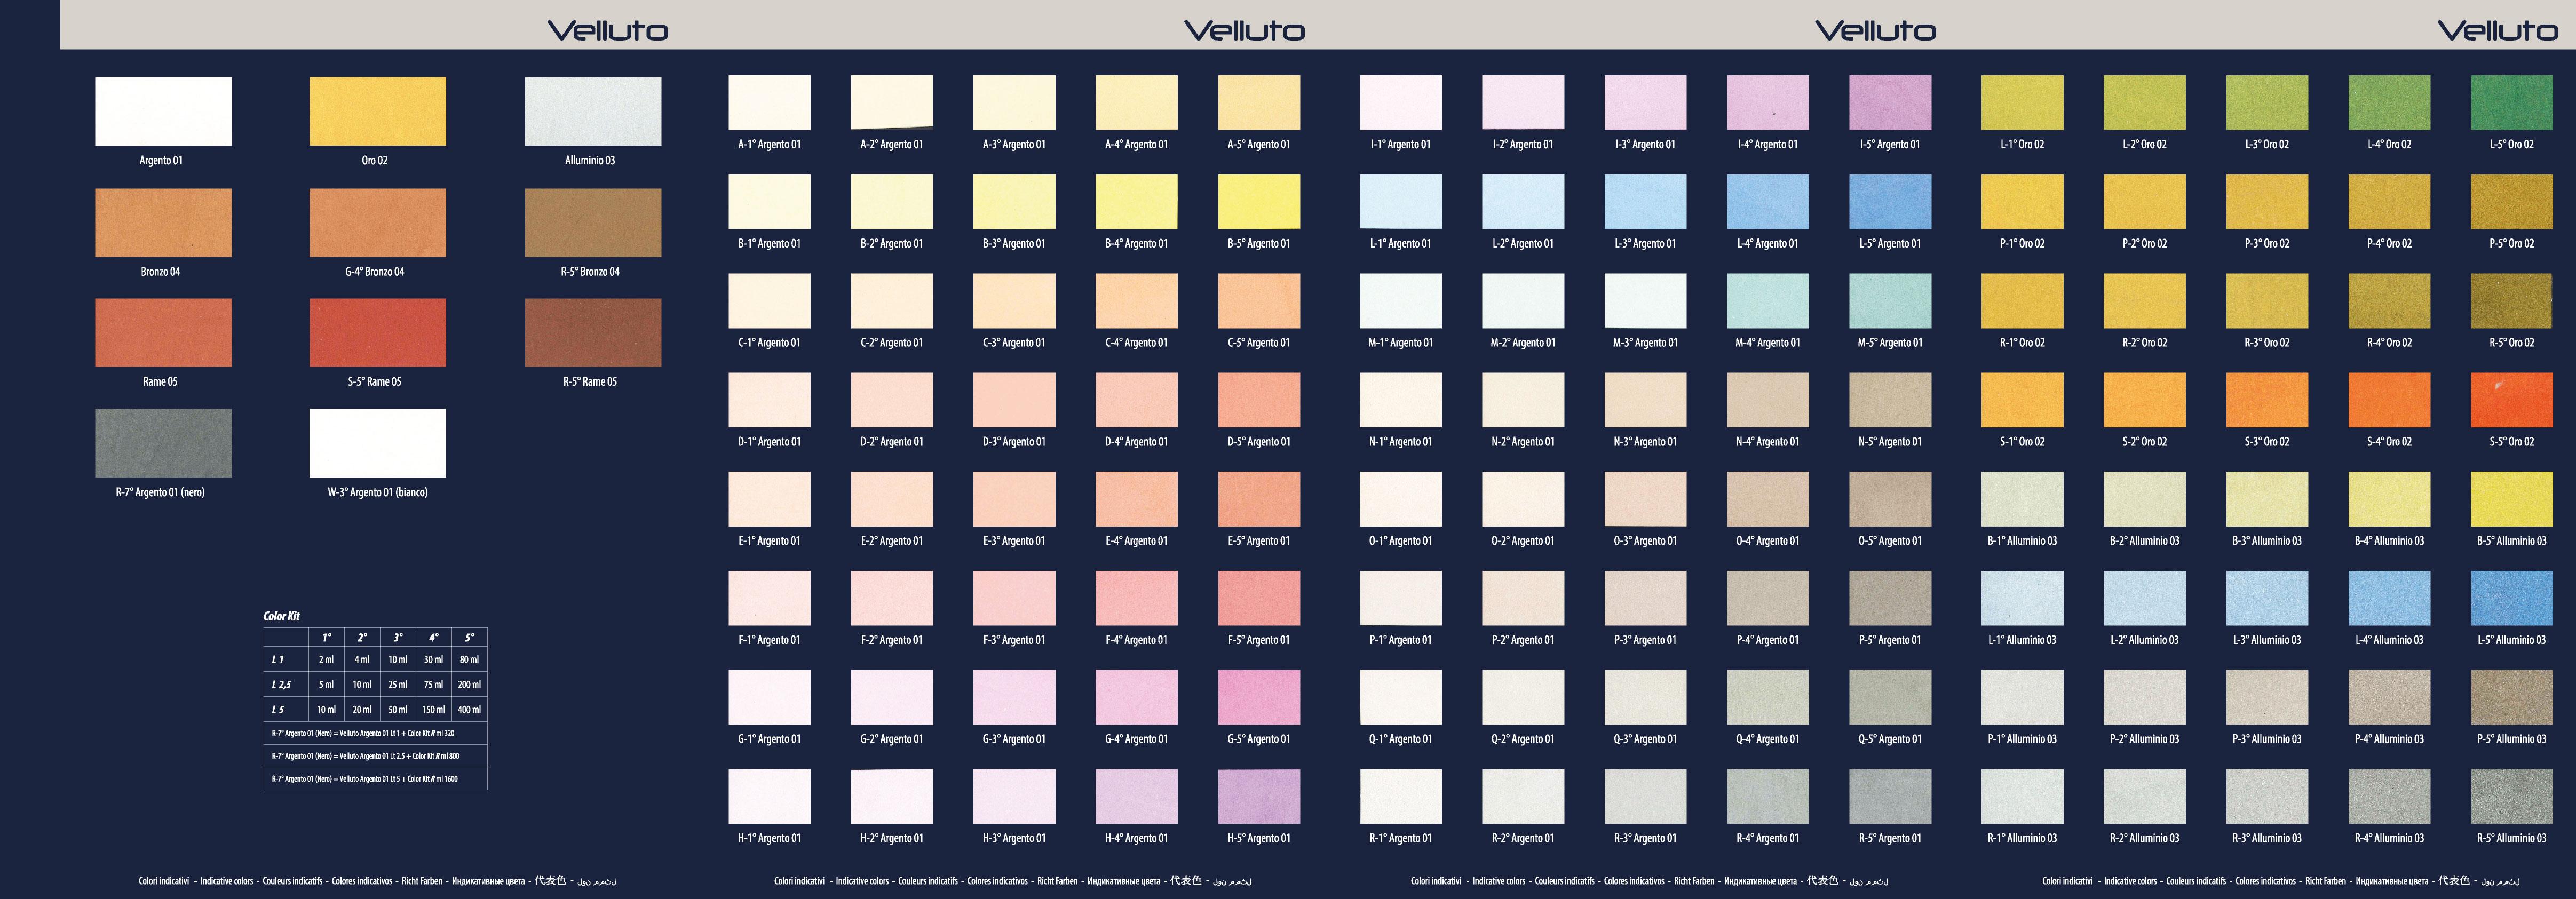 Rives colors decorations for Cartella colori pareti interne